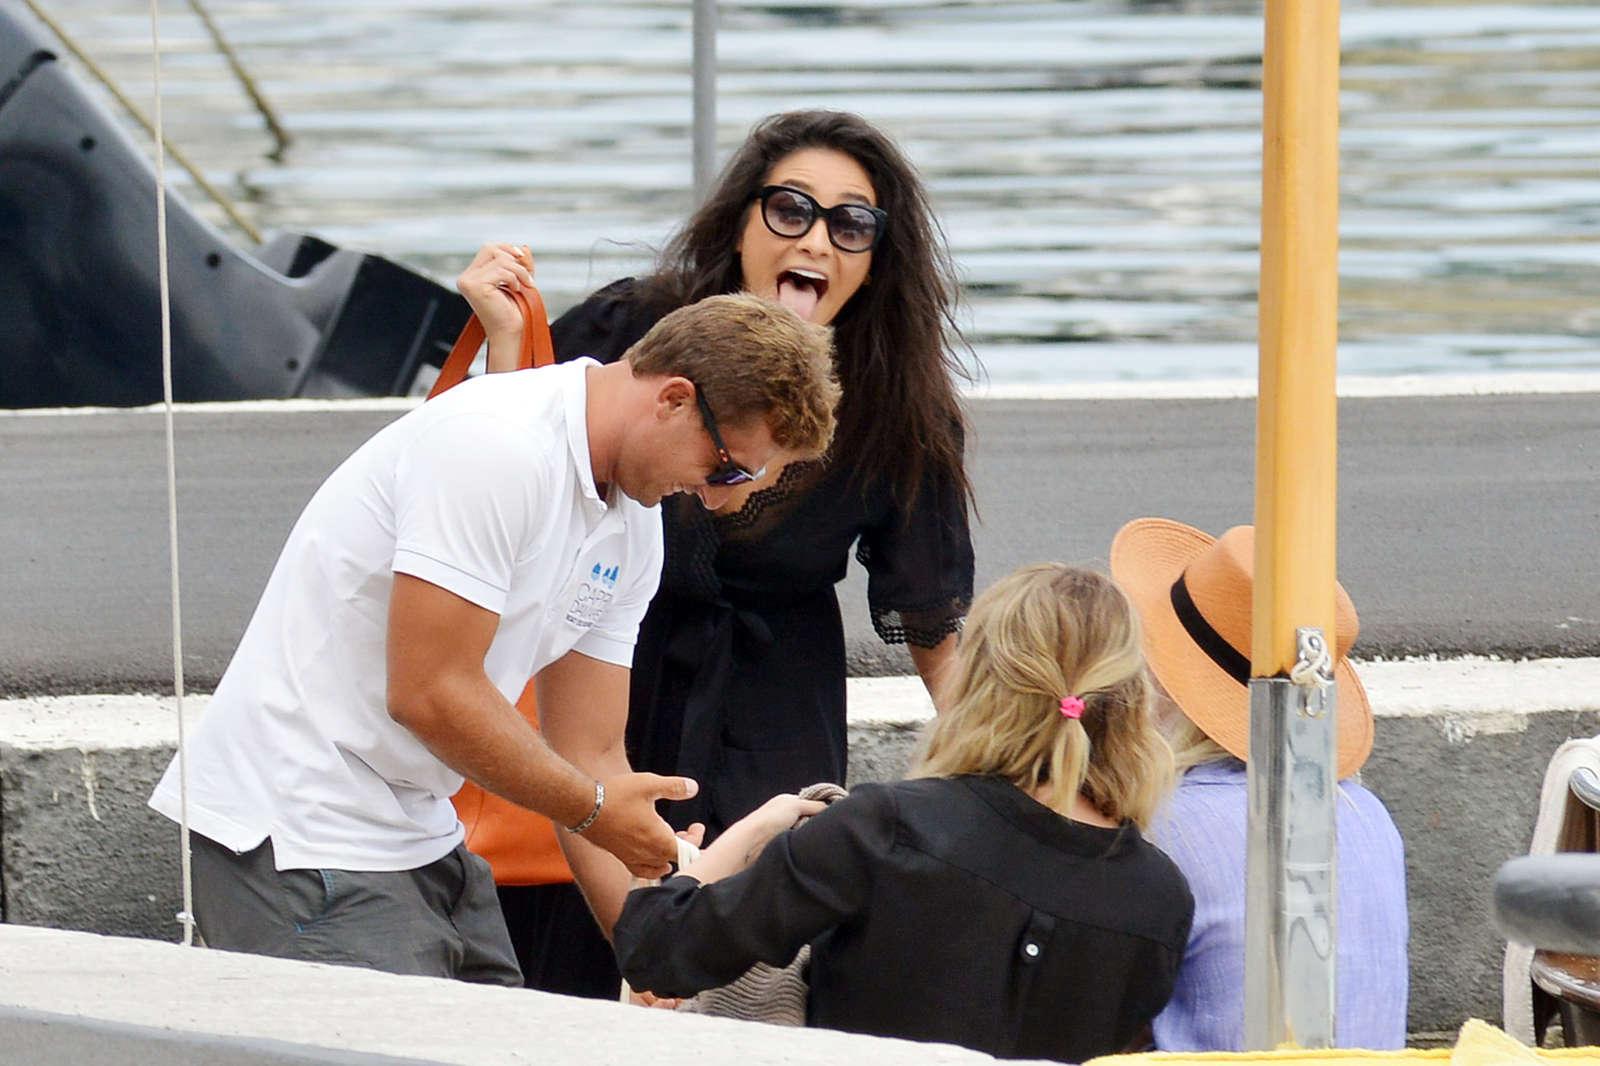 Ashley Benson 2016 : Ashley Benson, Shay Mitchell and Troian Bellisario on a boat in Capri -41